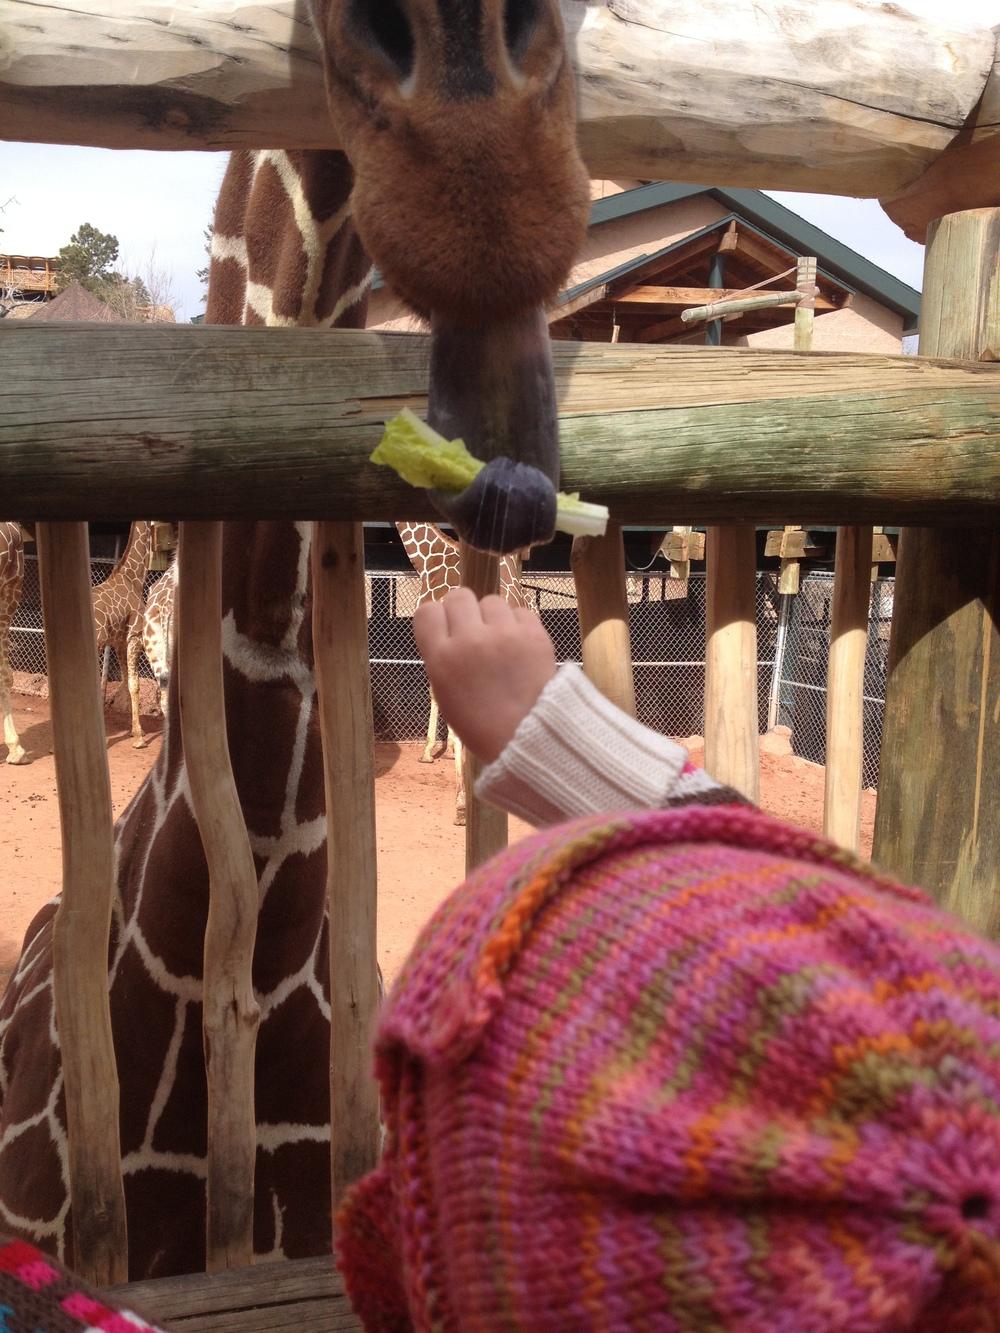 sticky, gooey giraffe tongues!